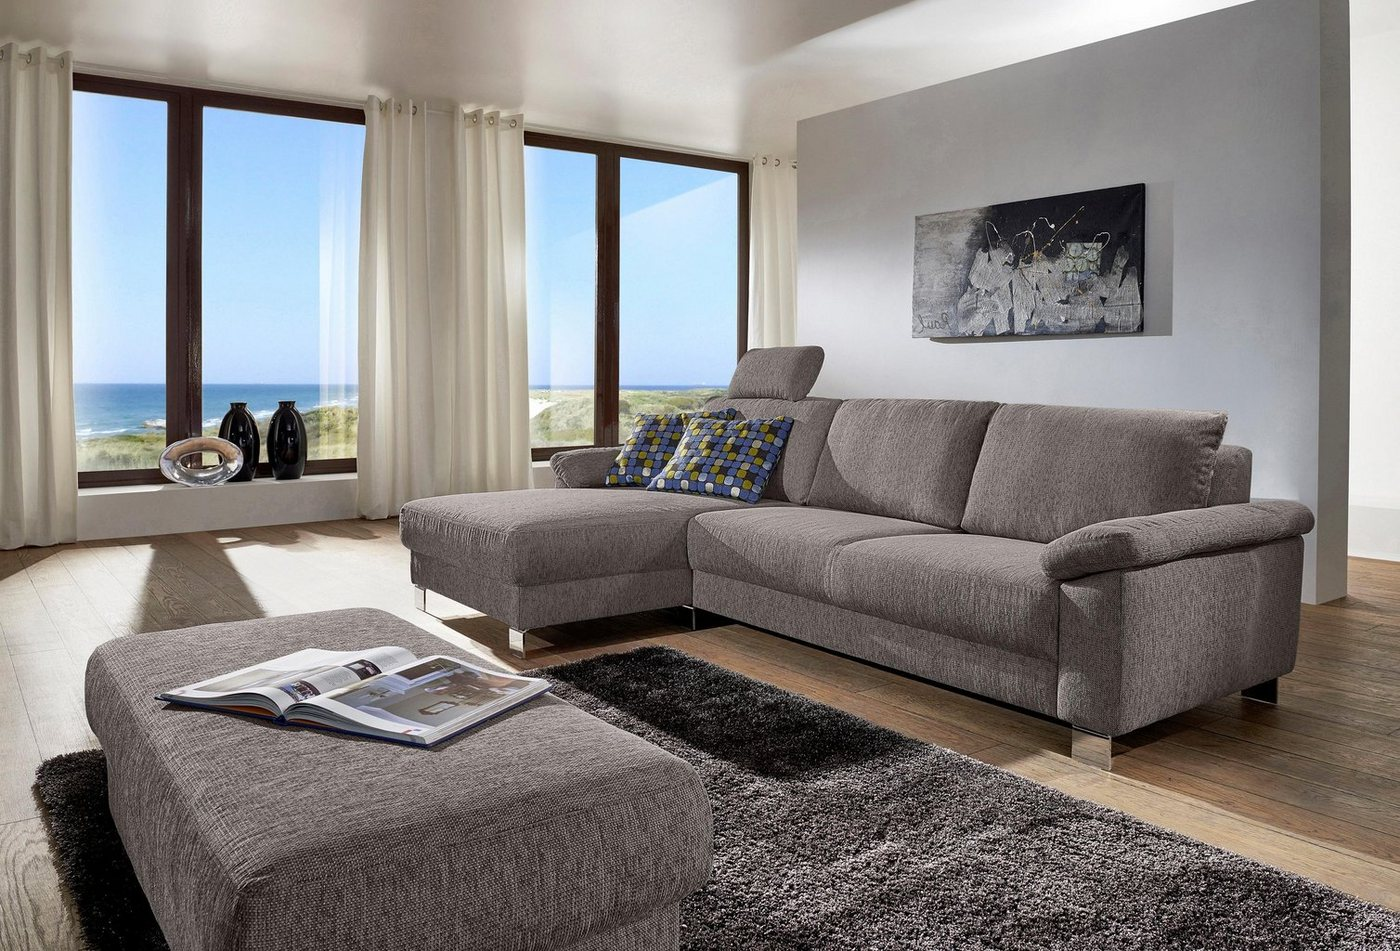 sofa bezug abnehmbar preisvergleiche erfahrungsberichte. Black Bedroom Furniture Sets. Home Design Ideas